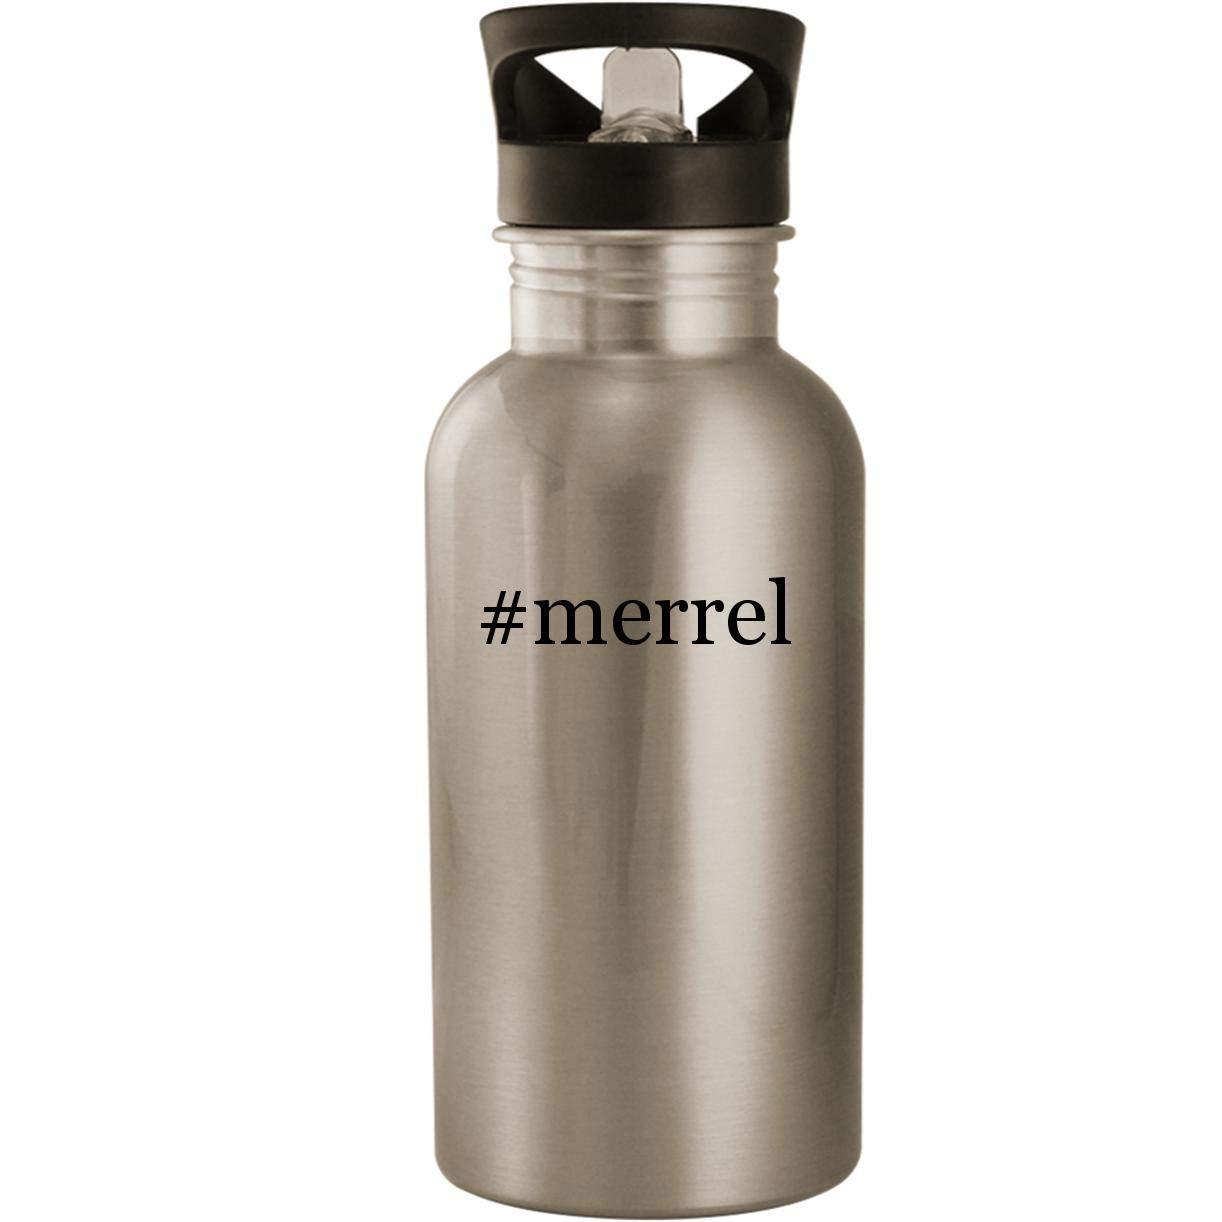 #merrel - ステンレススチール 20オンス ロードレディウォーターボトル シルバー US-C-07-18-02-080192-04-26-18-26 B07GN9KVMH シルバー